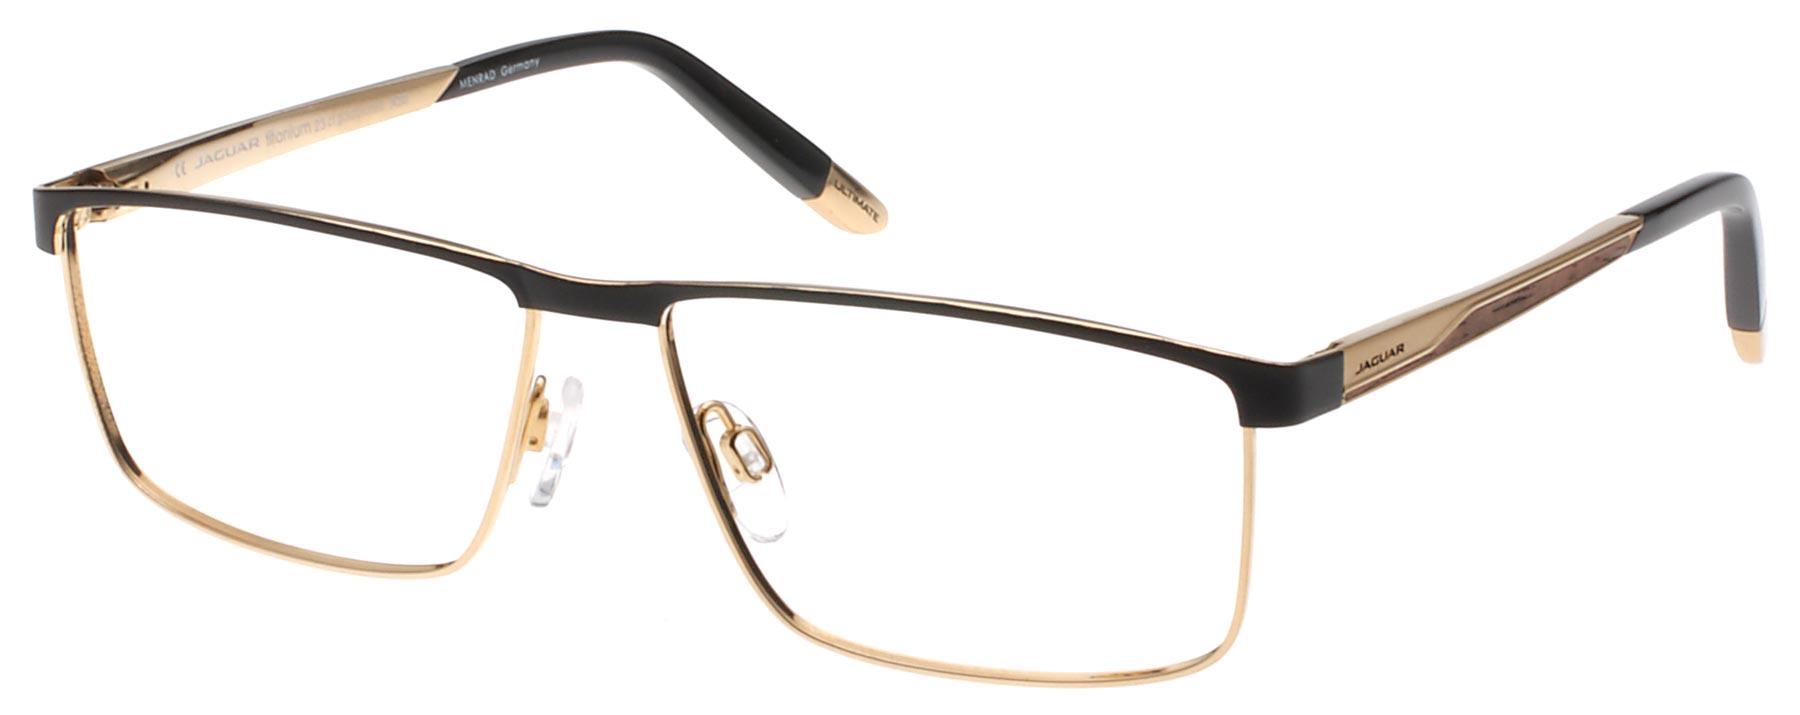 Eyeglass Frame Repair Connecticut : Jaguar 35813 Eyeglasses